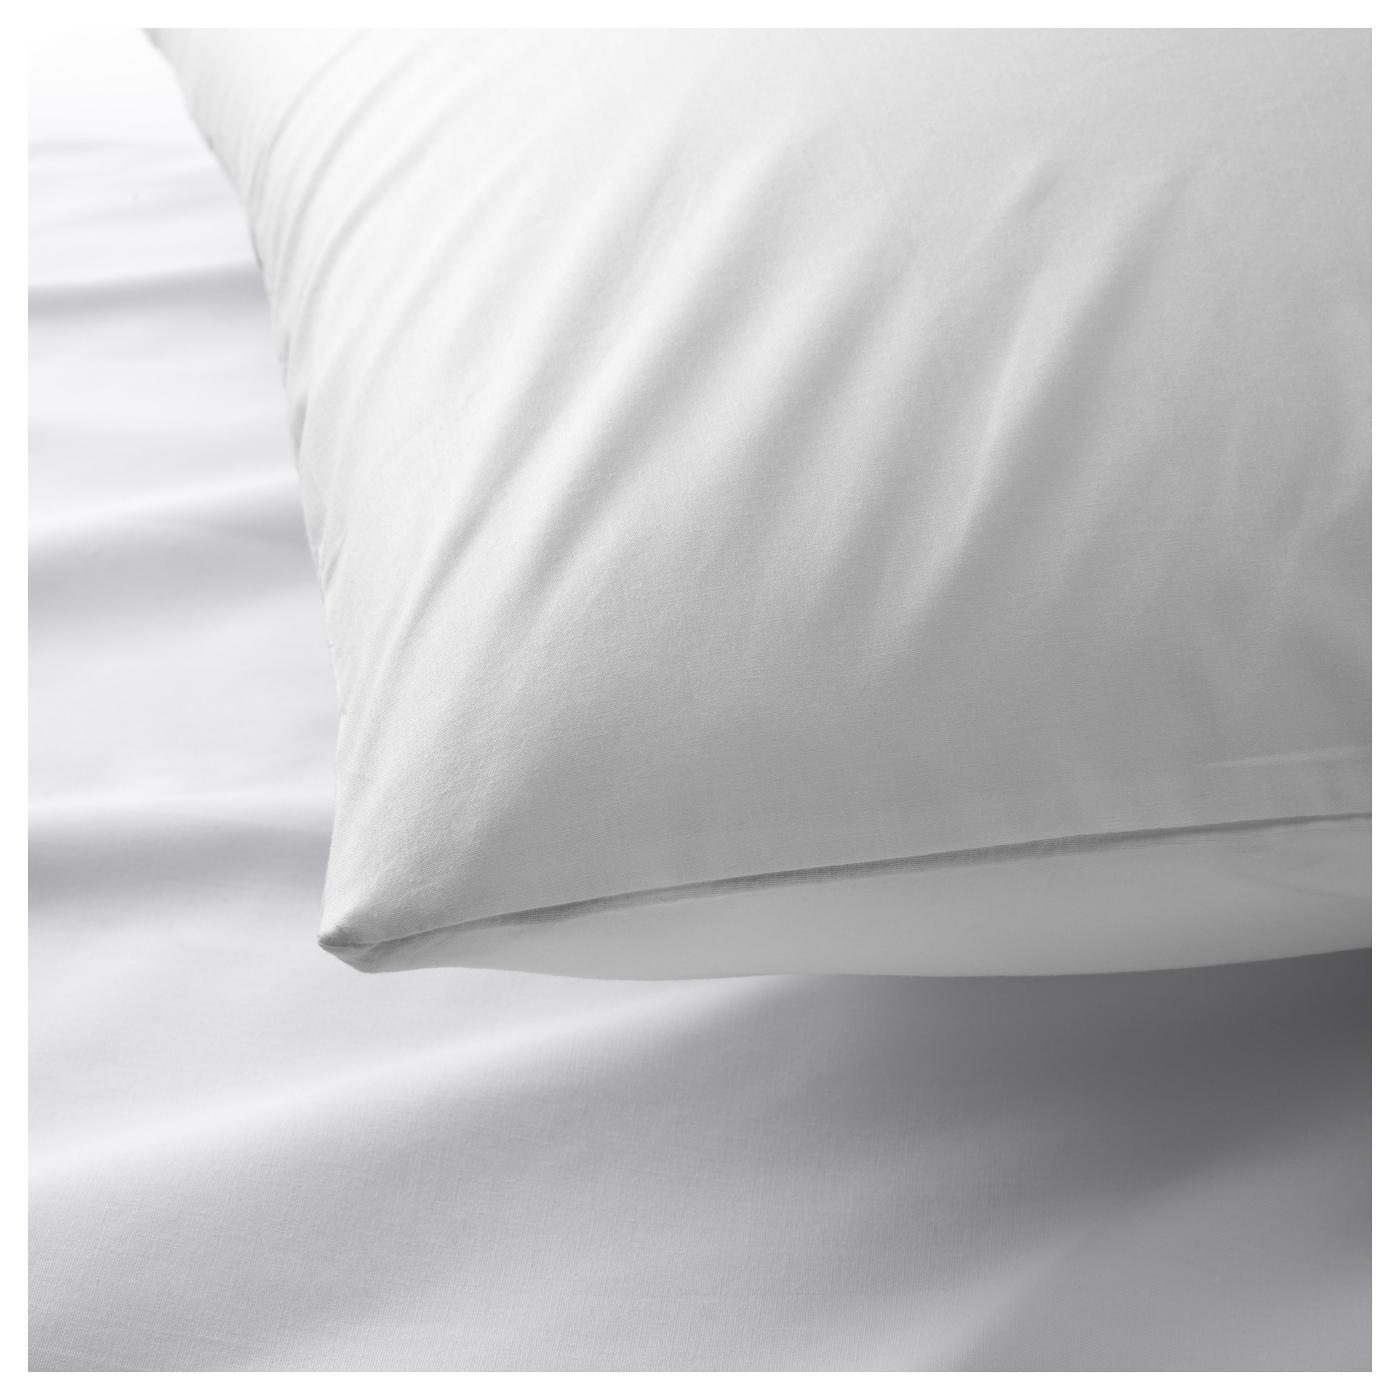 MNVIVA Pillowcase for memory foam pillow White 40x50 cm IKEA